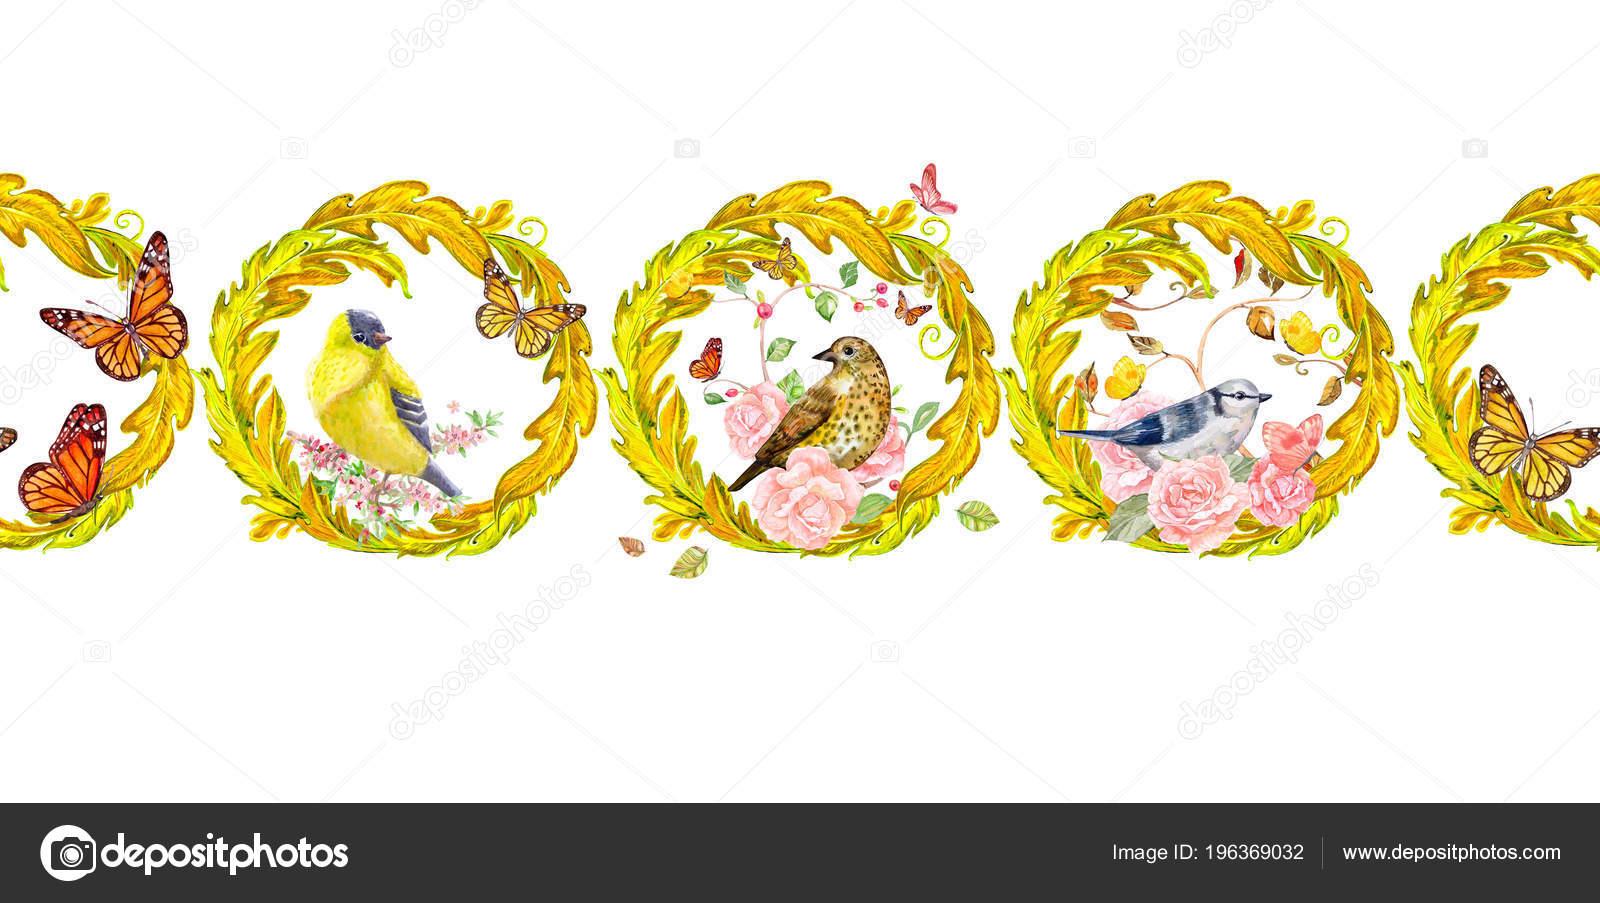 Rico Frontera Con Arabescos Oro Aves — Fotos de Stock © Oksana ...